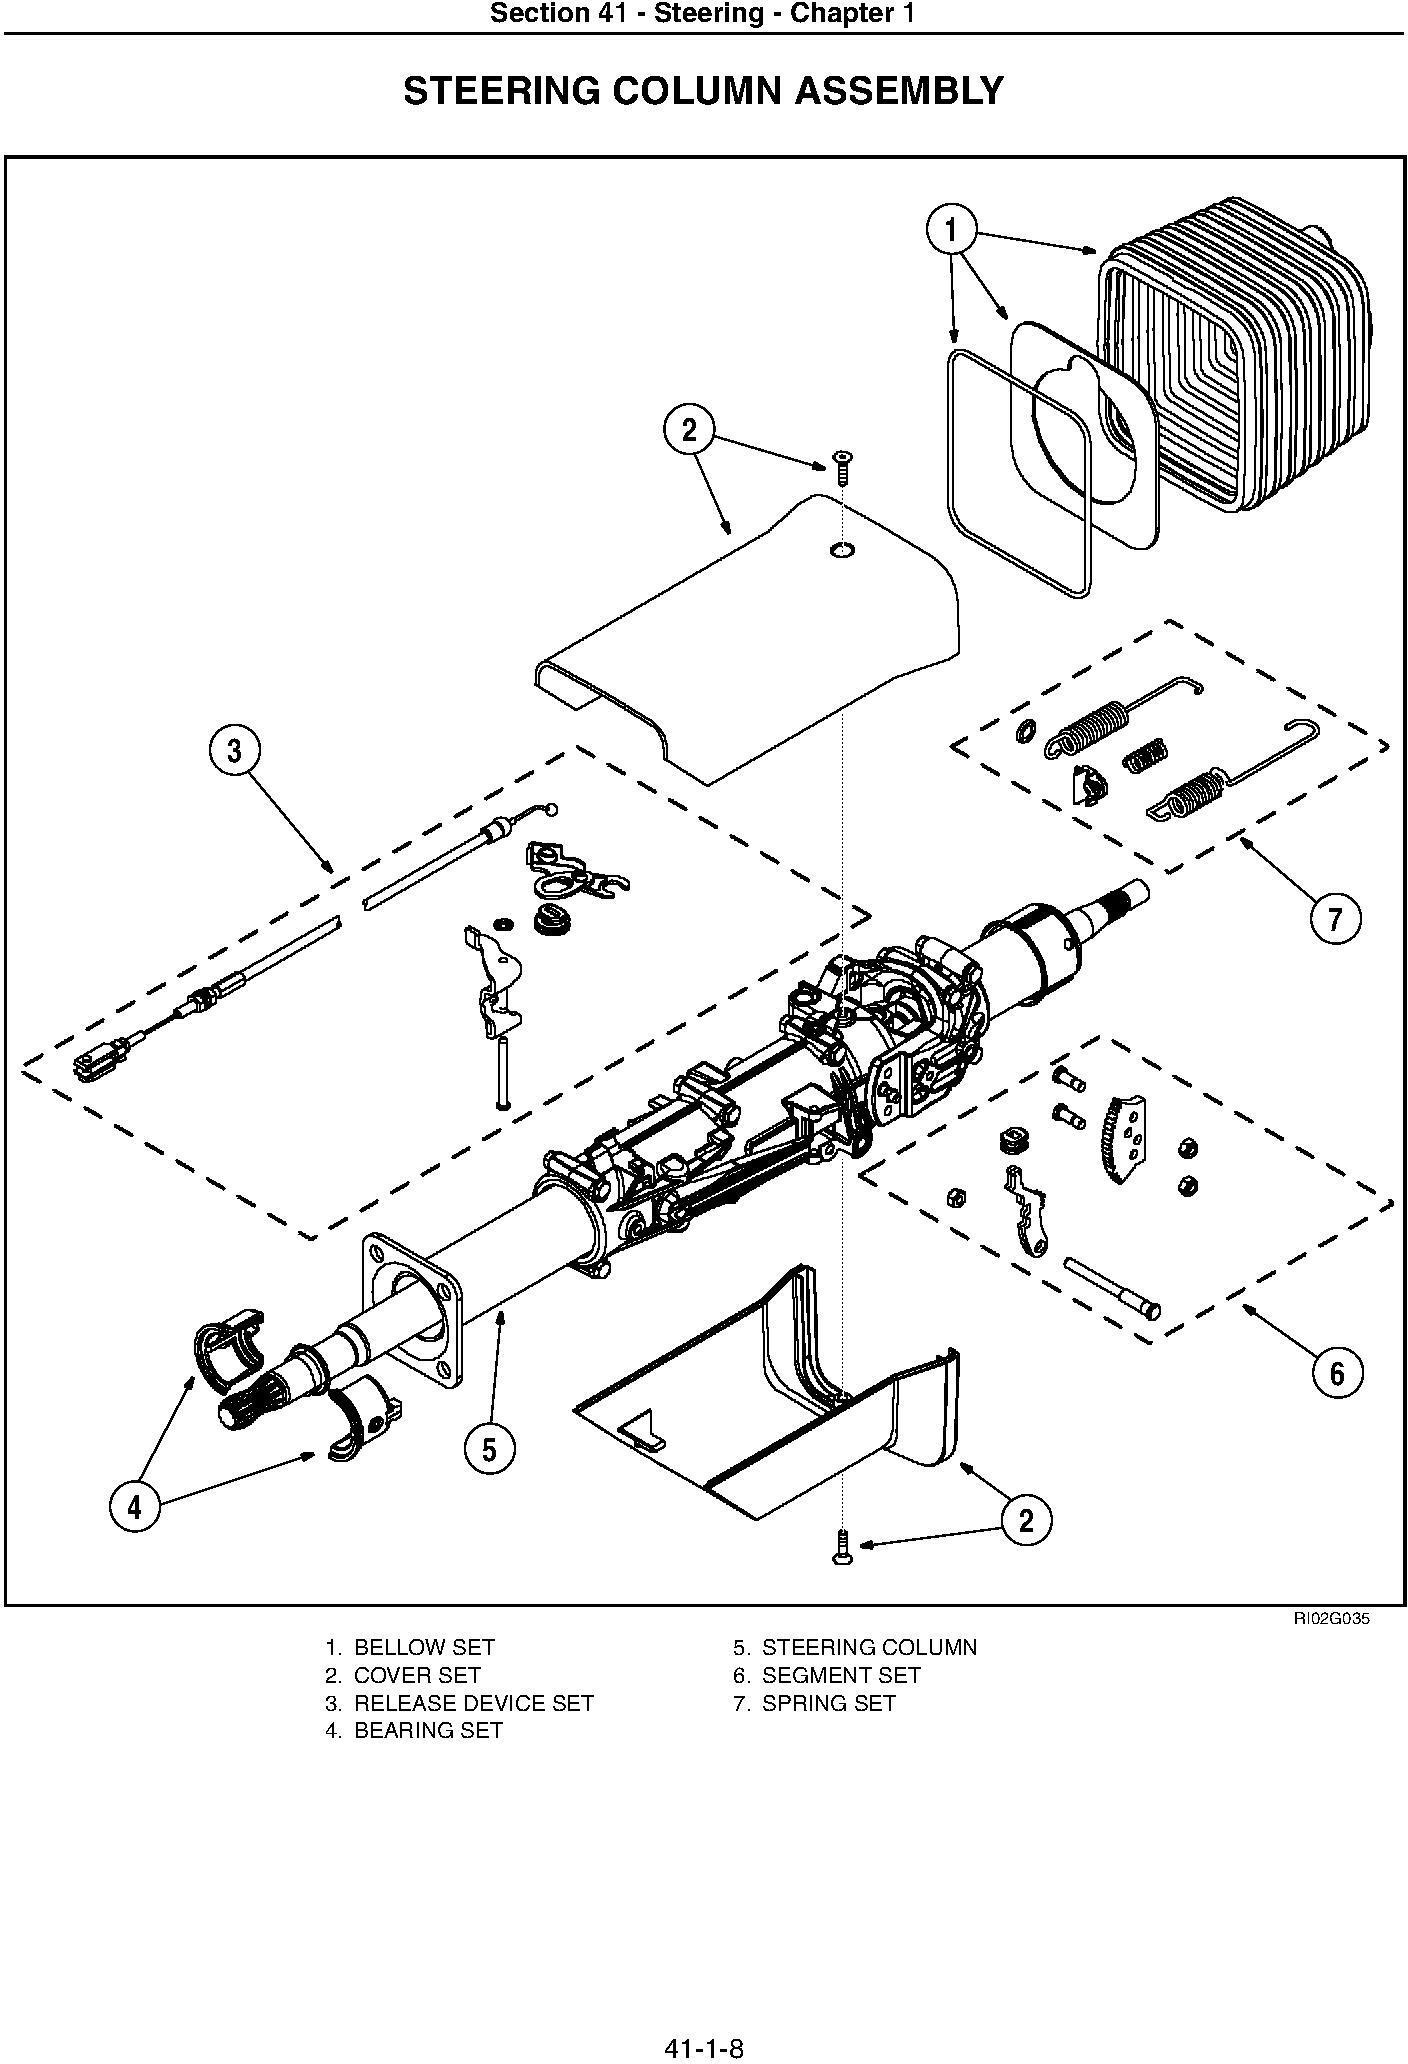 New Holland TG215, TG245, TG275, TG305 Tractor Service Manual - 2